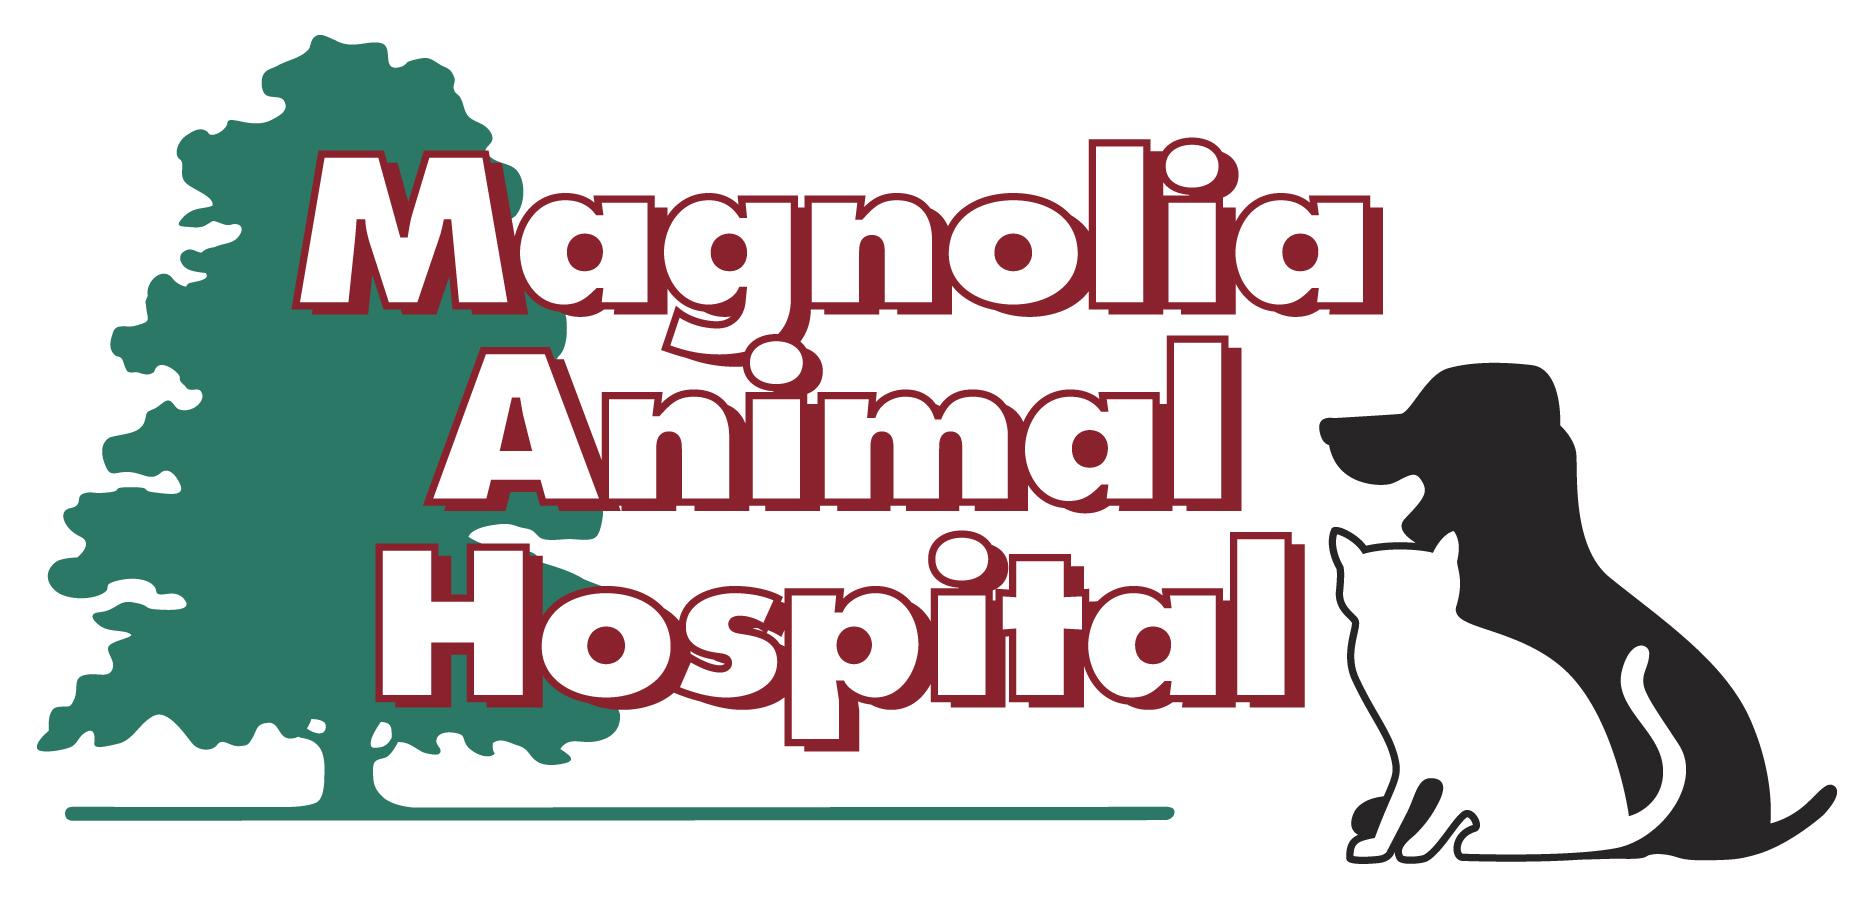 Sponsor Magnolia Animal Hospital